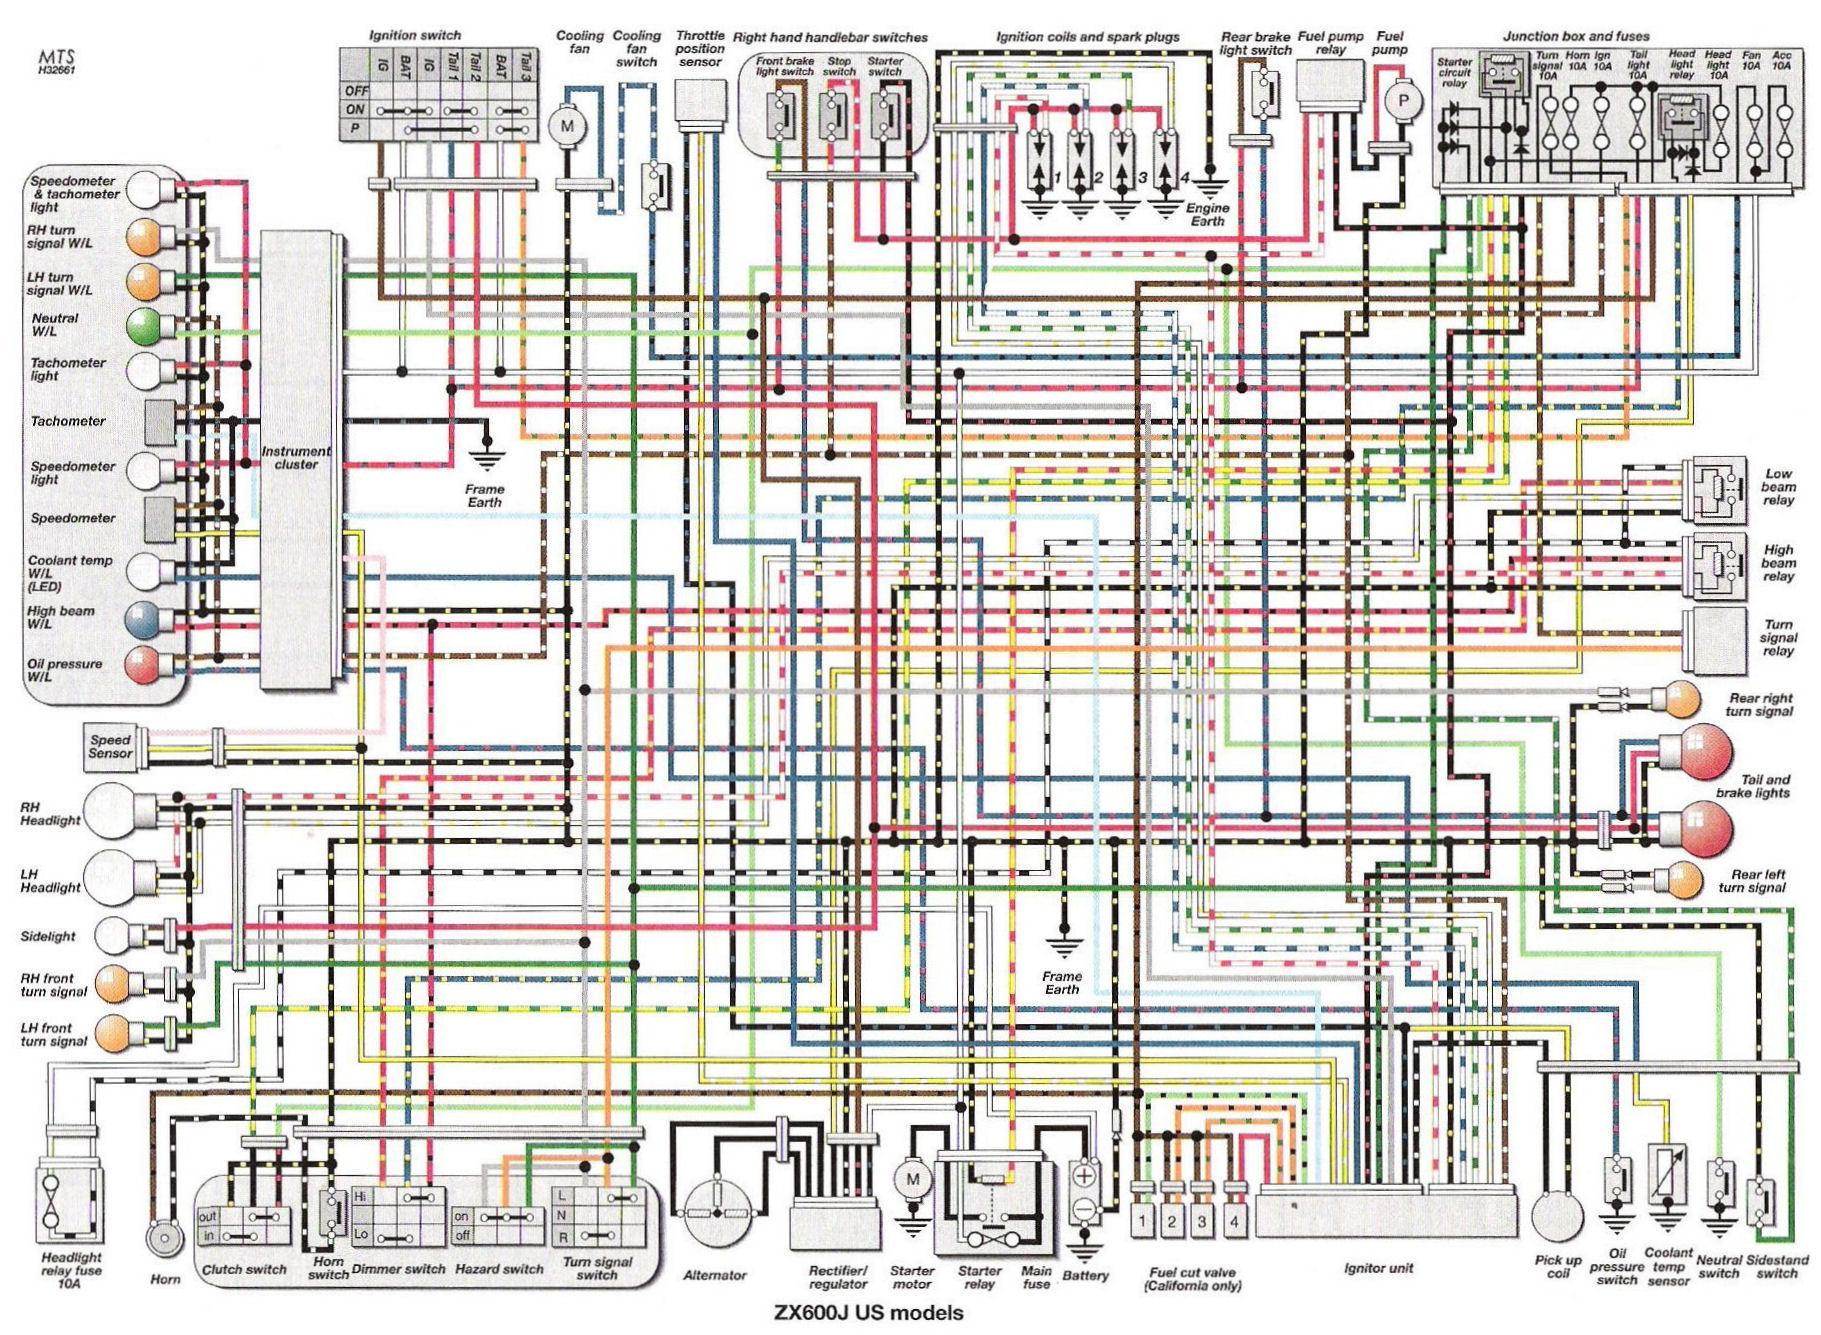 zx600j_us?zoom\=2.625\&resize\=665%2C488 2004 gsxr 600 wiring diagram 2003 gsxr 600 wiring diagram \u2022 wiring 99 gsxr 600 wiring diagram at gsmportal.co